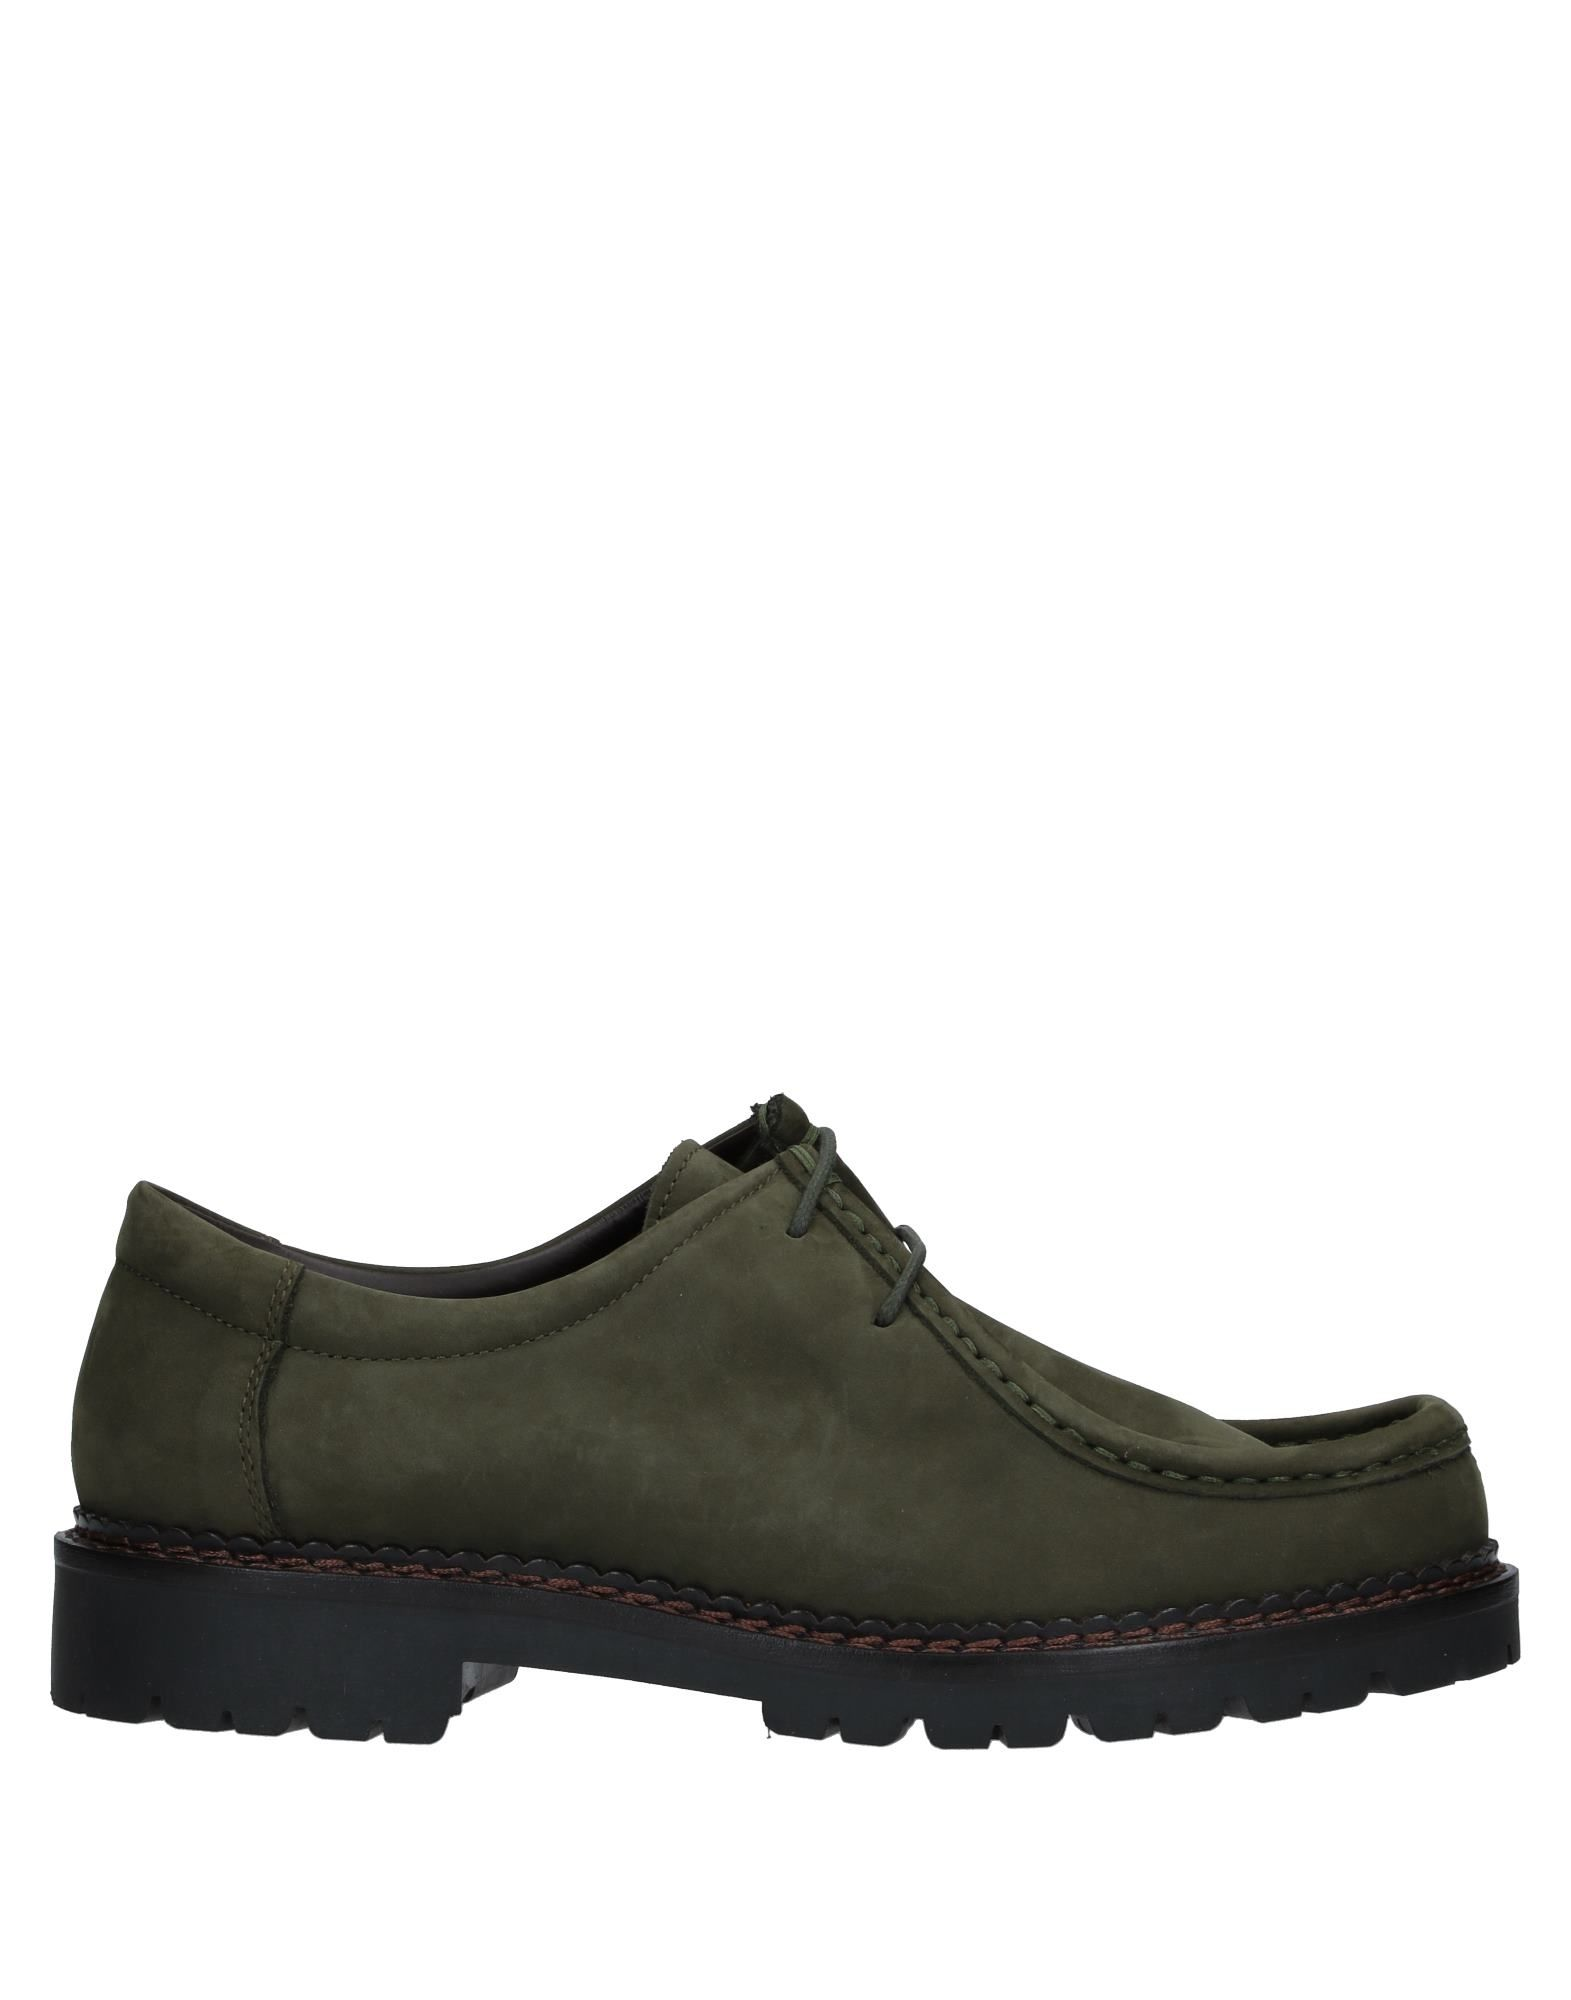 Chaussures À Lacets Maze chaussures Homme - Chaussures À Lacets Maze chaussures   - 11737393HC